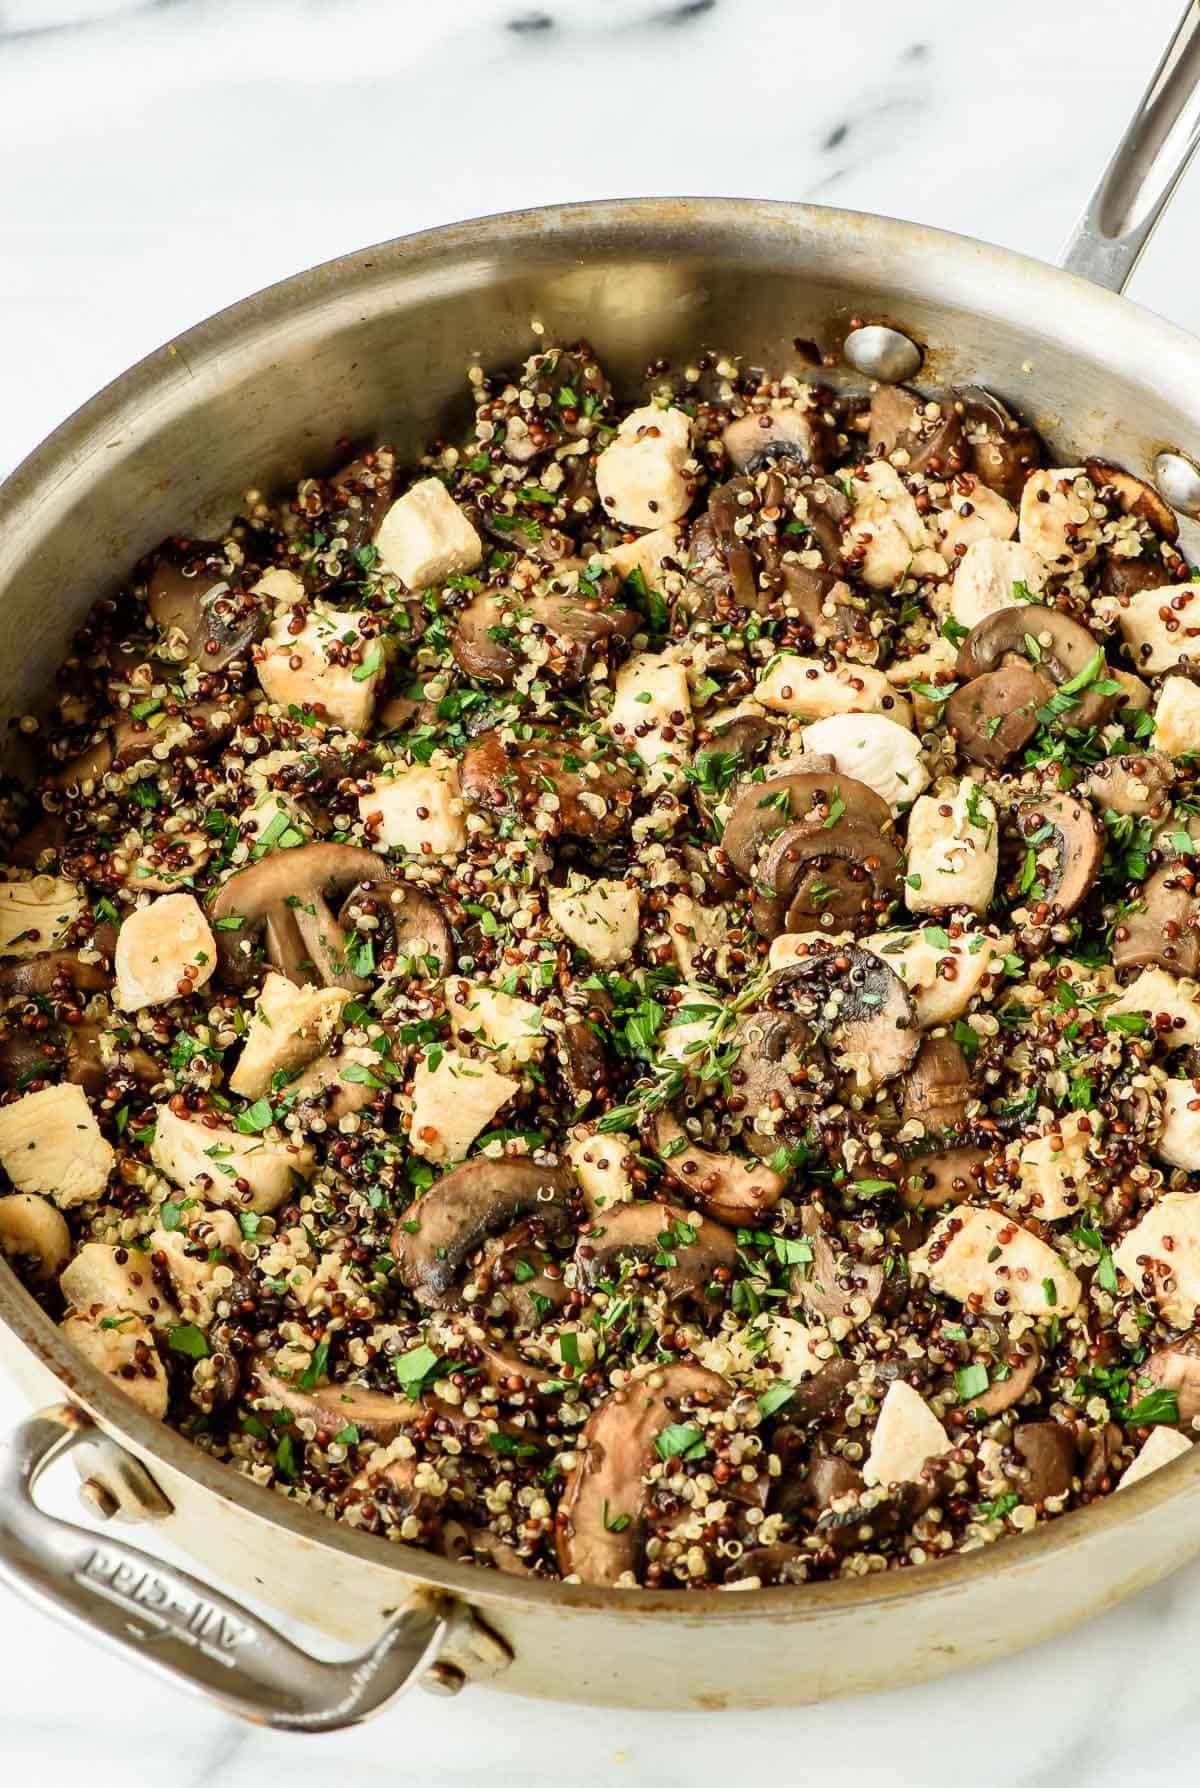 Quinoa Mushroom Recipe  Skillet Mushroom Chicken and Quinoa Recipe